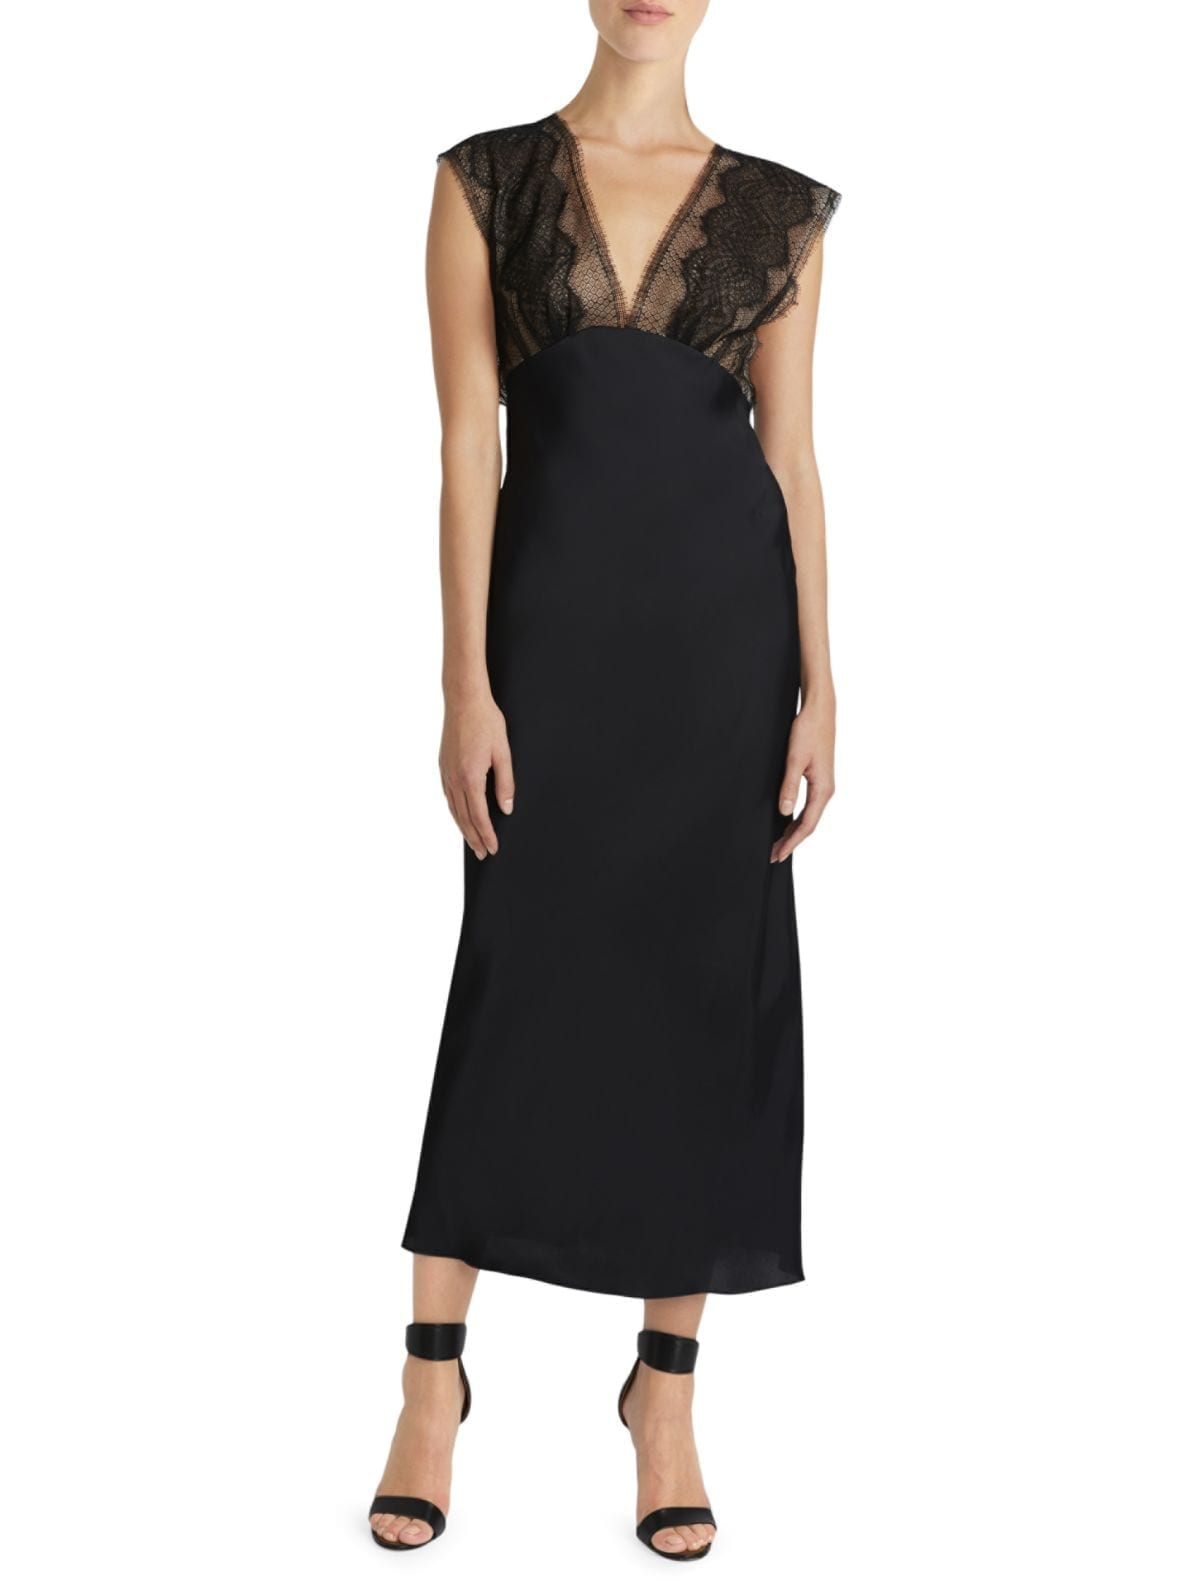 VICTORIA BECKHAM Lace Tabard Midi Black Dress